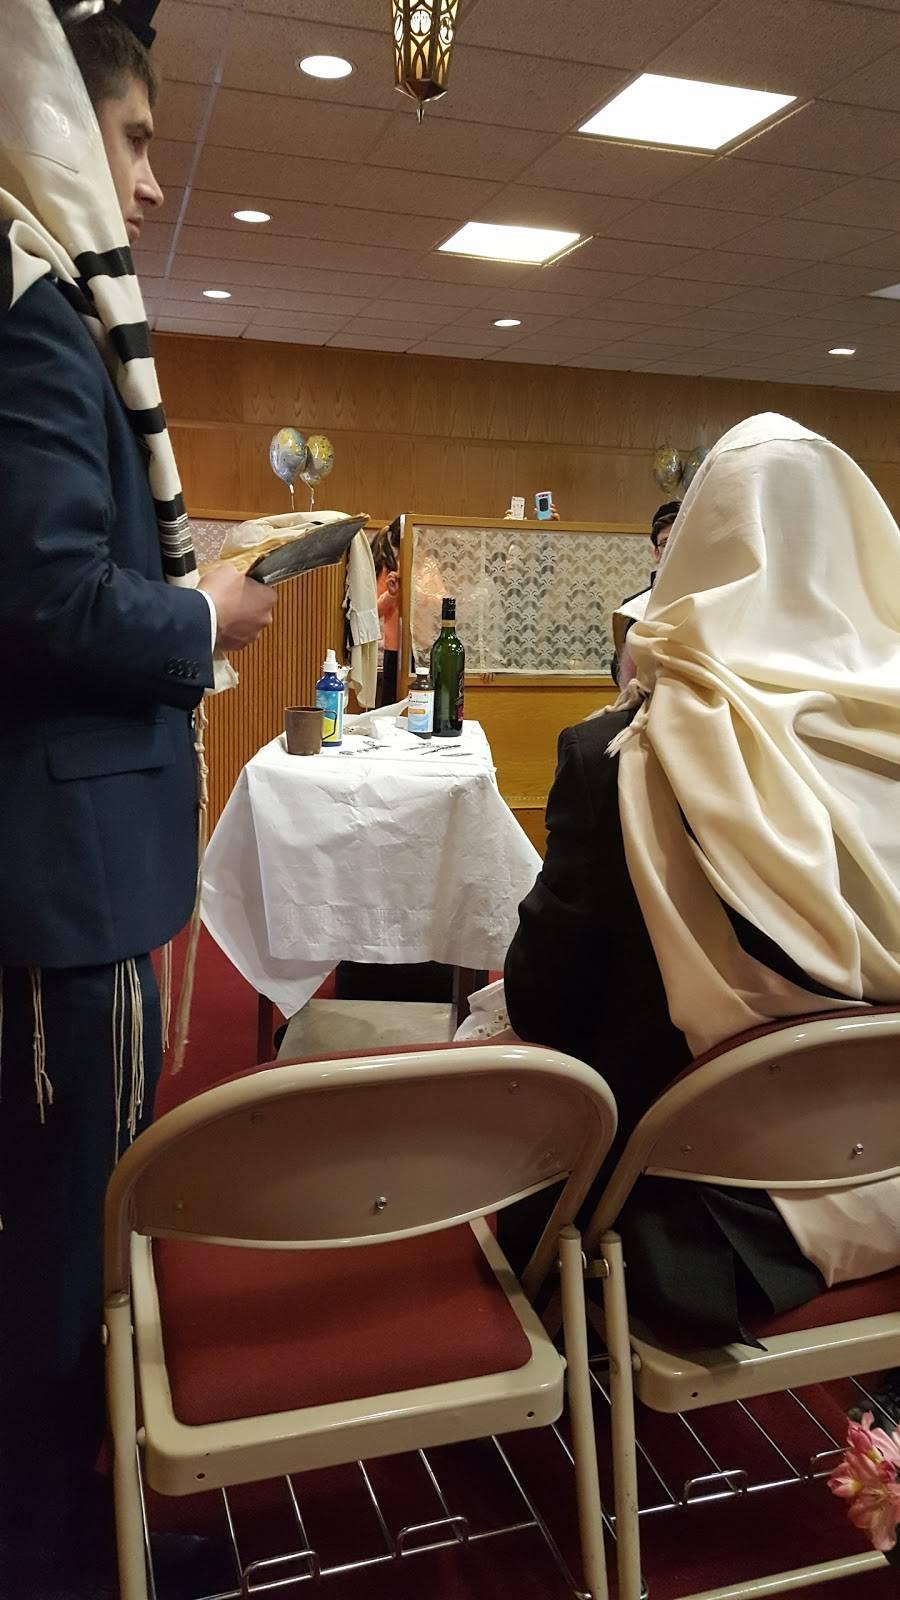 Young Israel of Greater Buffalo - synagogue  | Photo 4 of 7 | Address: 105 Maple Rd, Buffalo, NY 14221, USA | Phone: (716) 634-0212